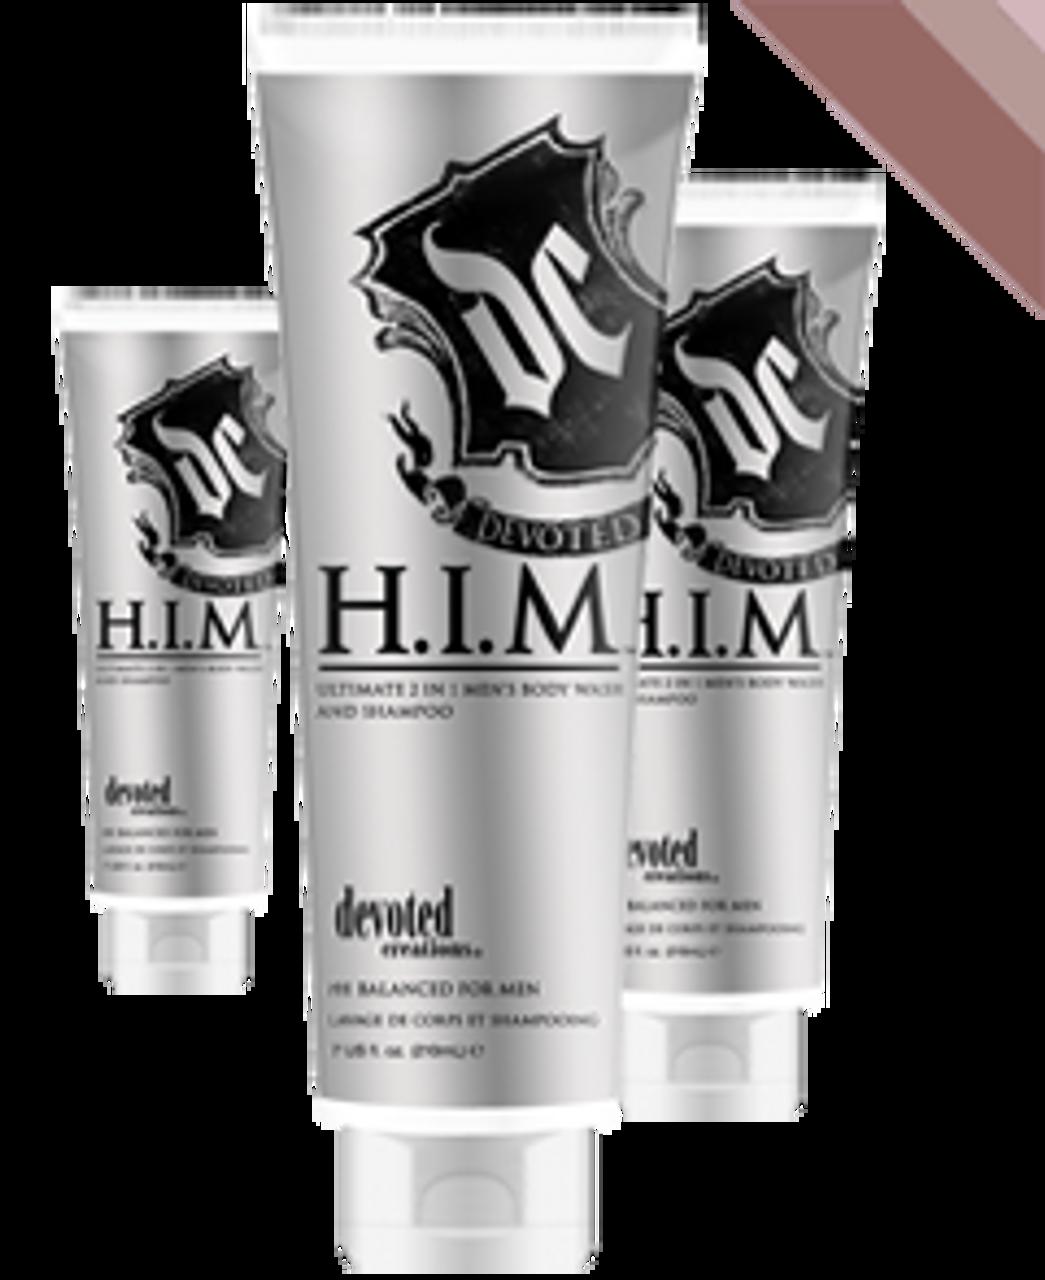 H.I.M. Shampoo & Bodywash 7oz Devoted Creations